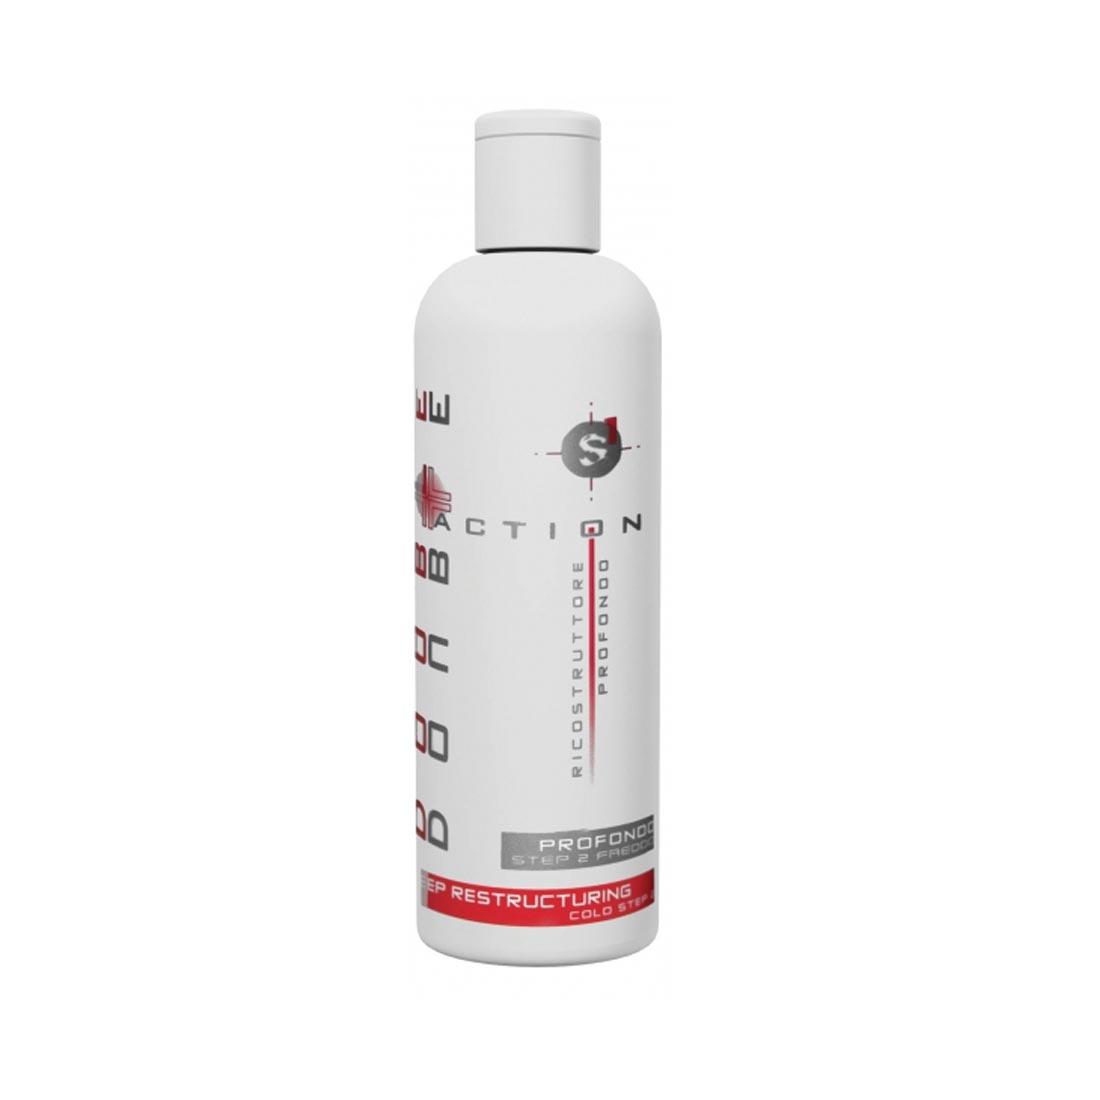 Hair Company Регенерирующее средство горячей фазы Double Action Ricostruttore Profondo Step 1 Caldo 250 мл (Hair Company Professional)